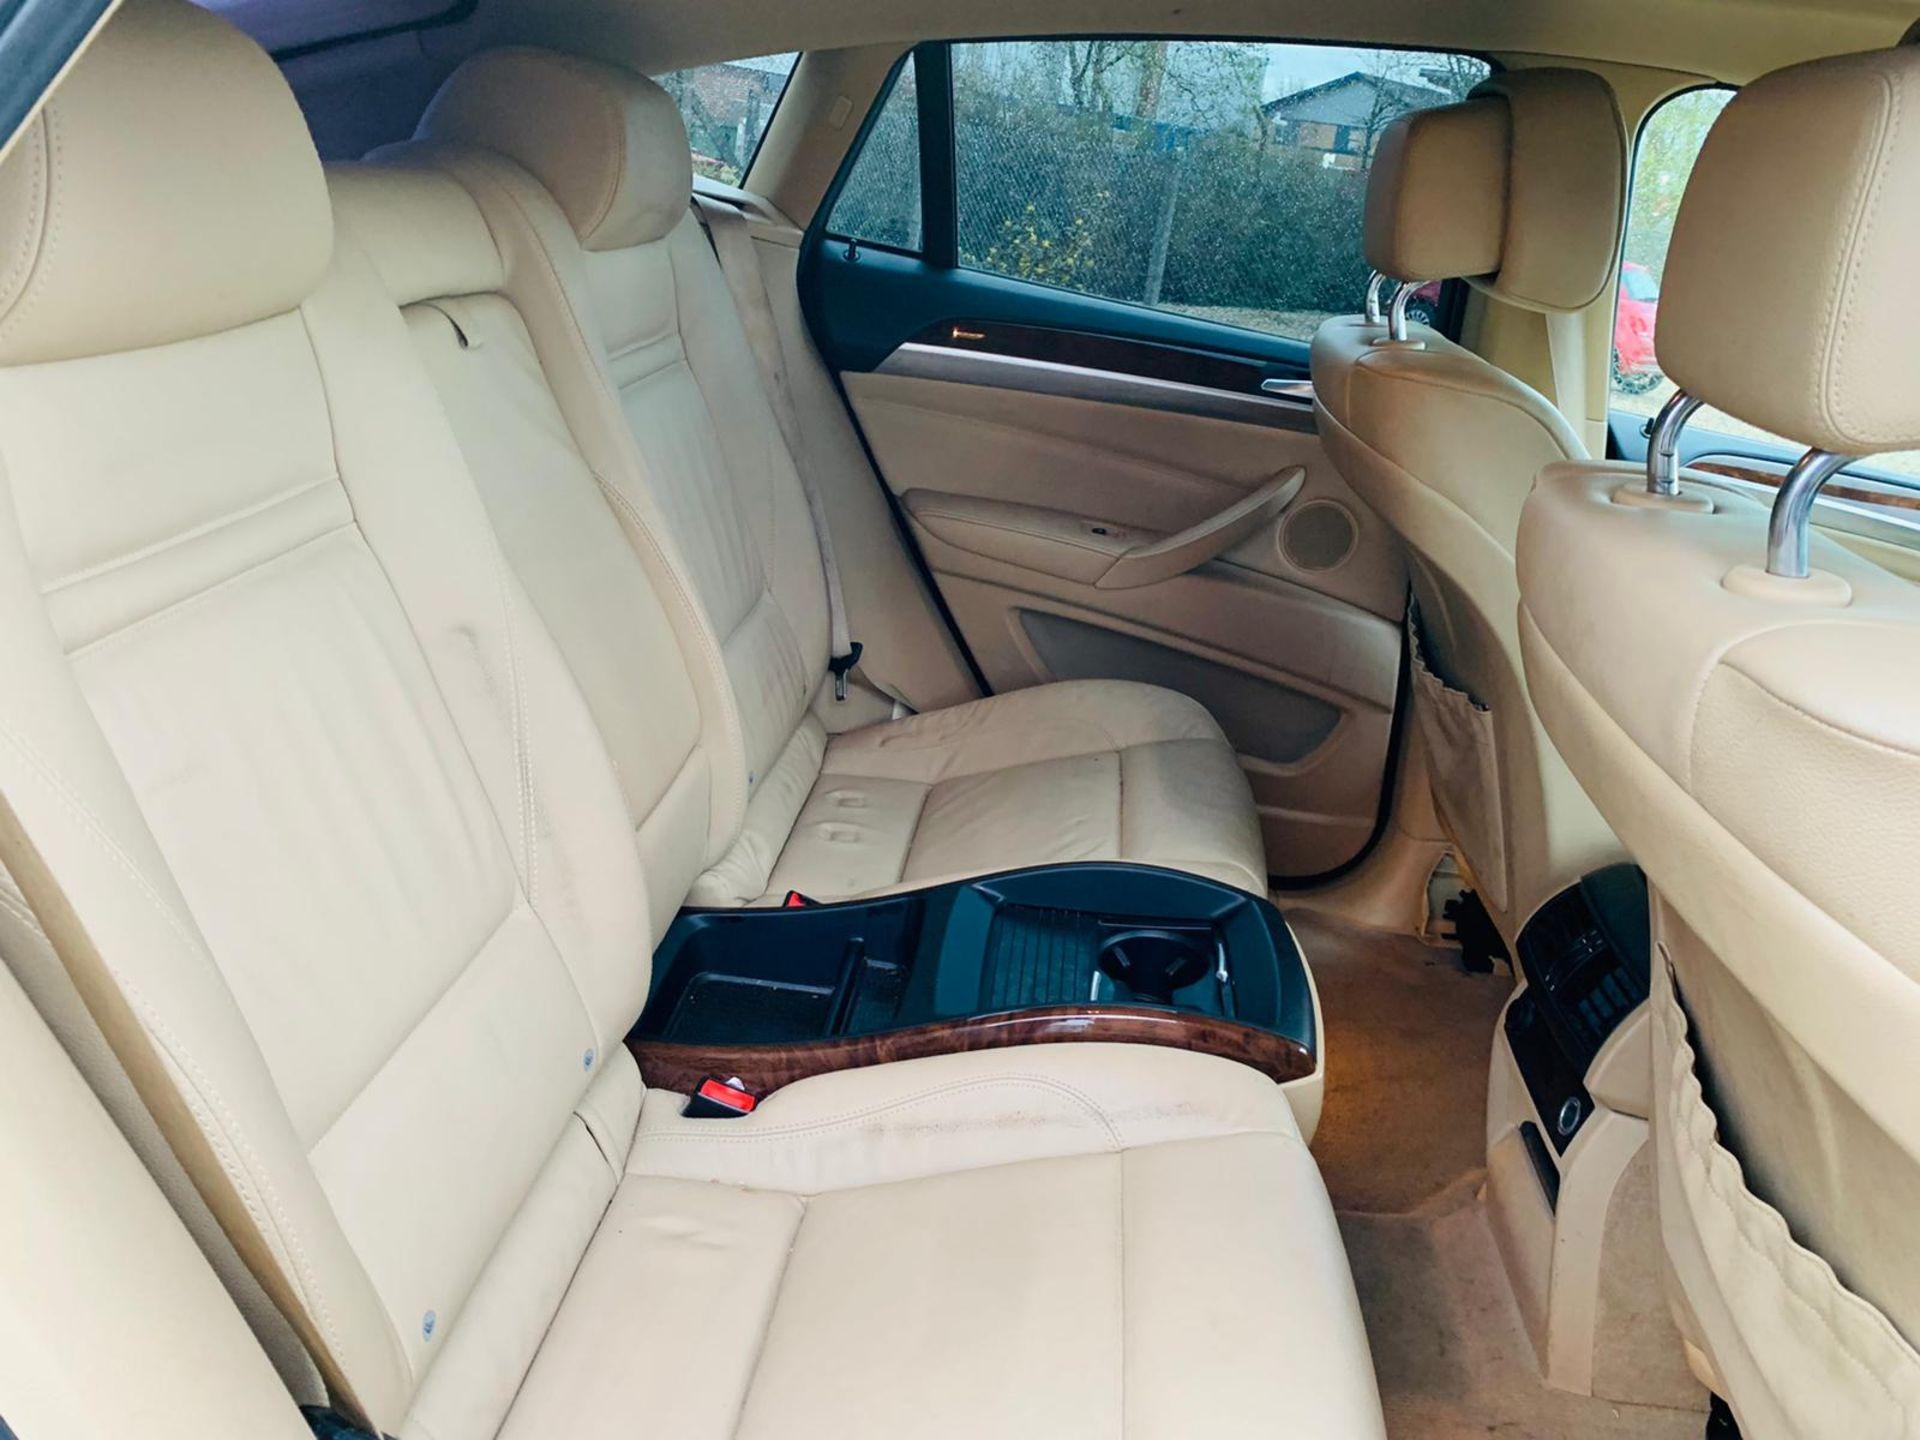 Reseve Met - BMW X6 xDrive 3.0d Auto - 2014 Reg - Leather Interior -Parking Sensors - Reversing Cam - Image 16 of 30